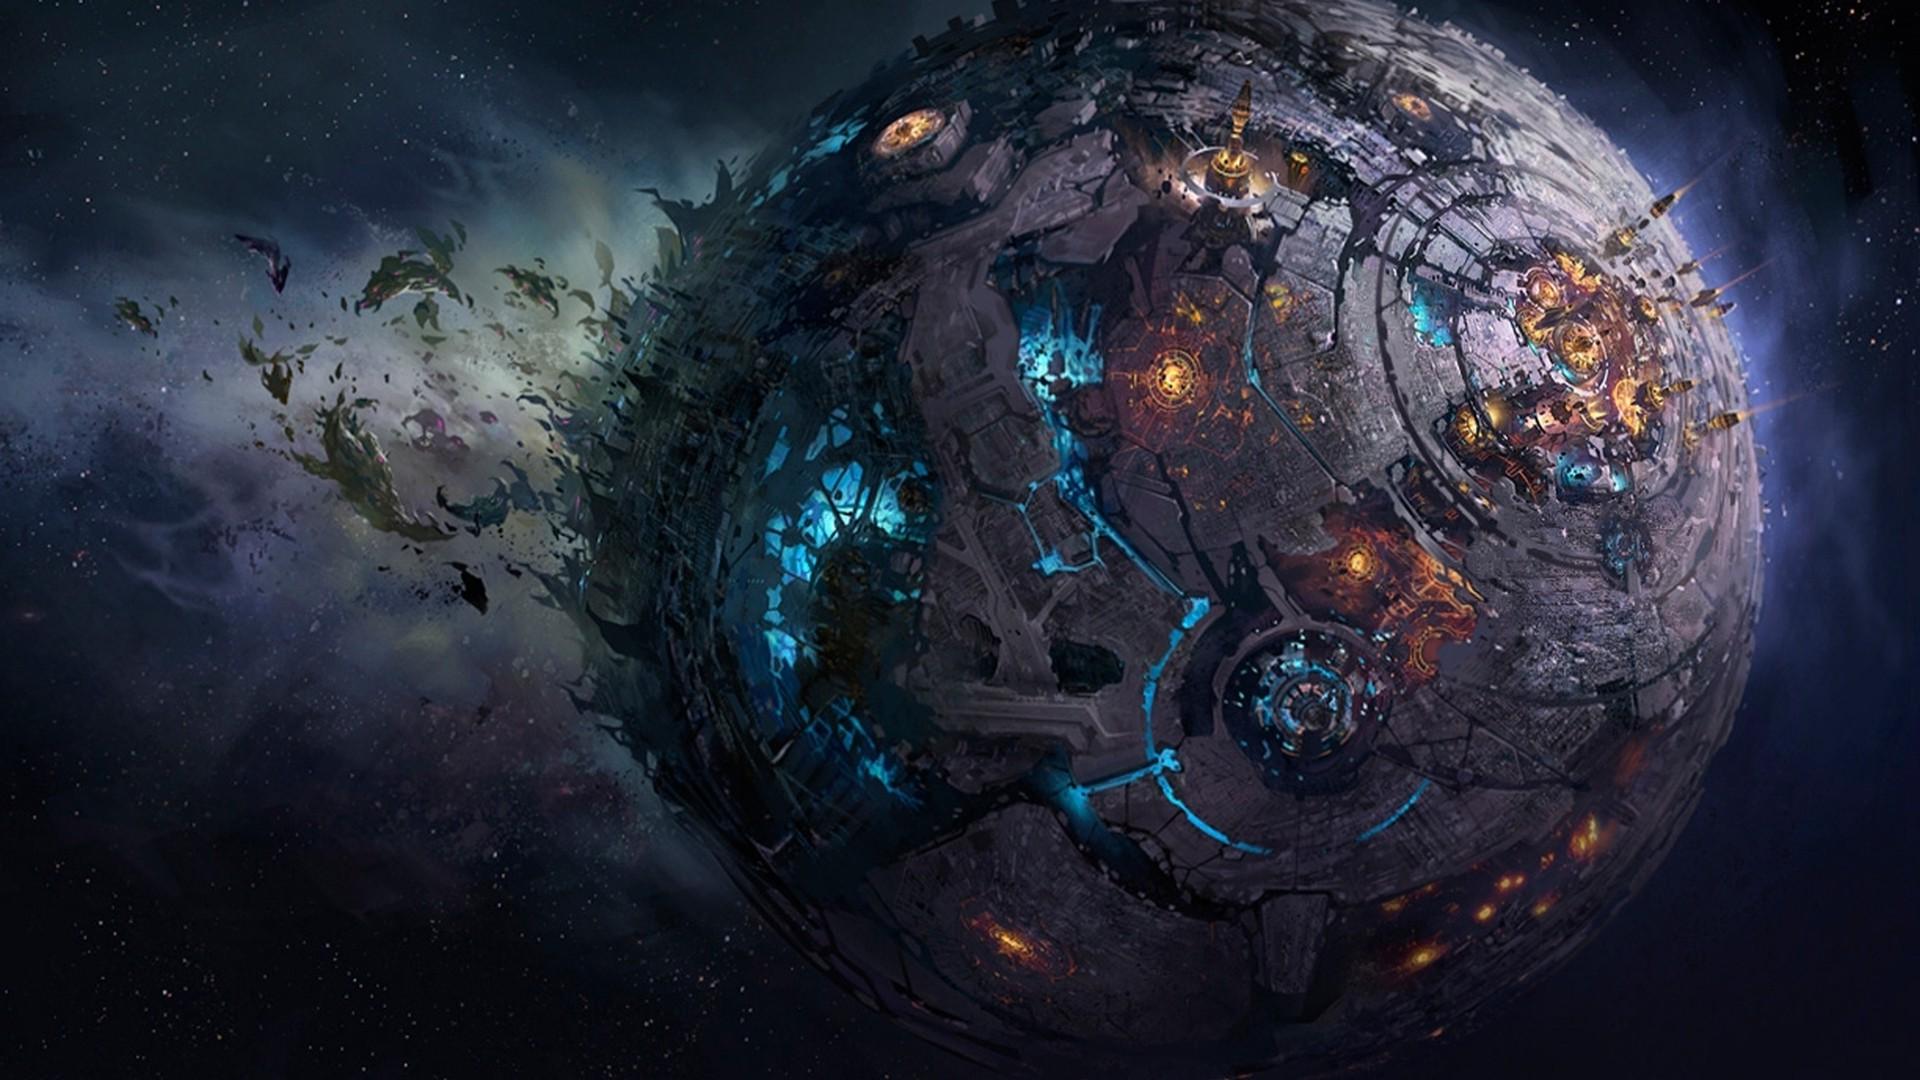 Fall Of Cybertron Wallpaper Artwork Fantasy Art Digital Art Planet City